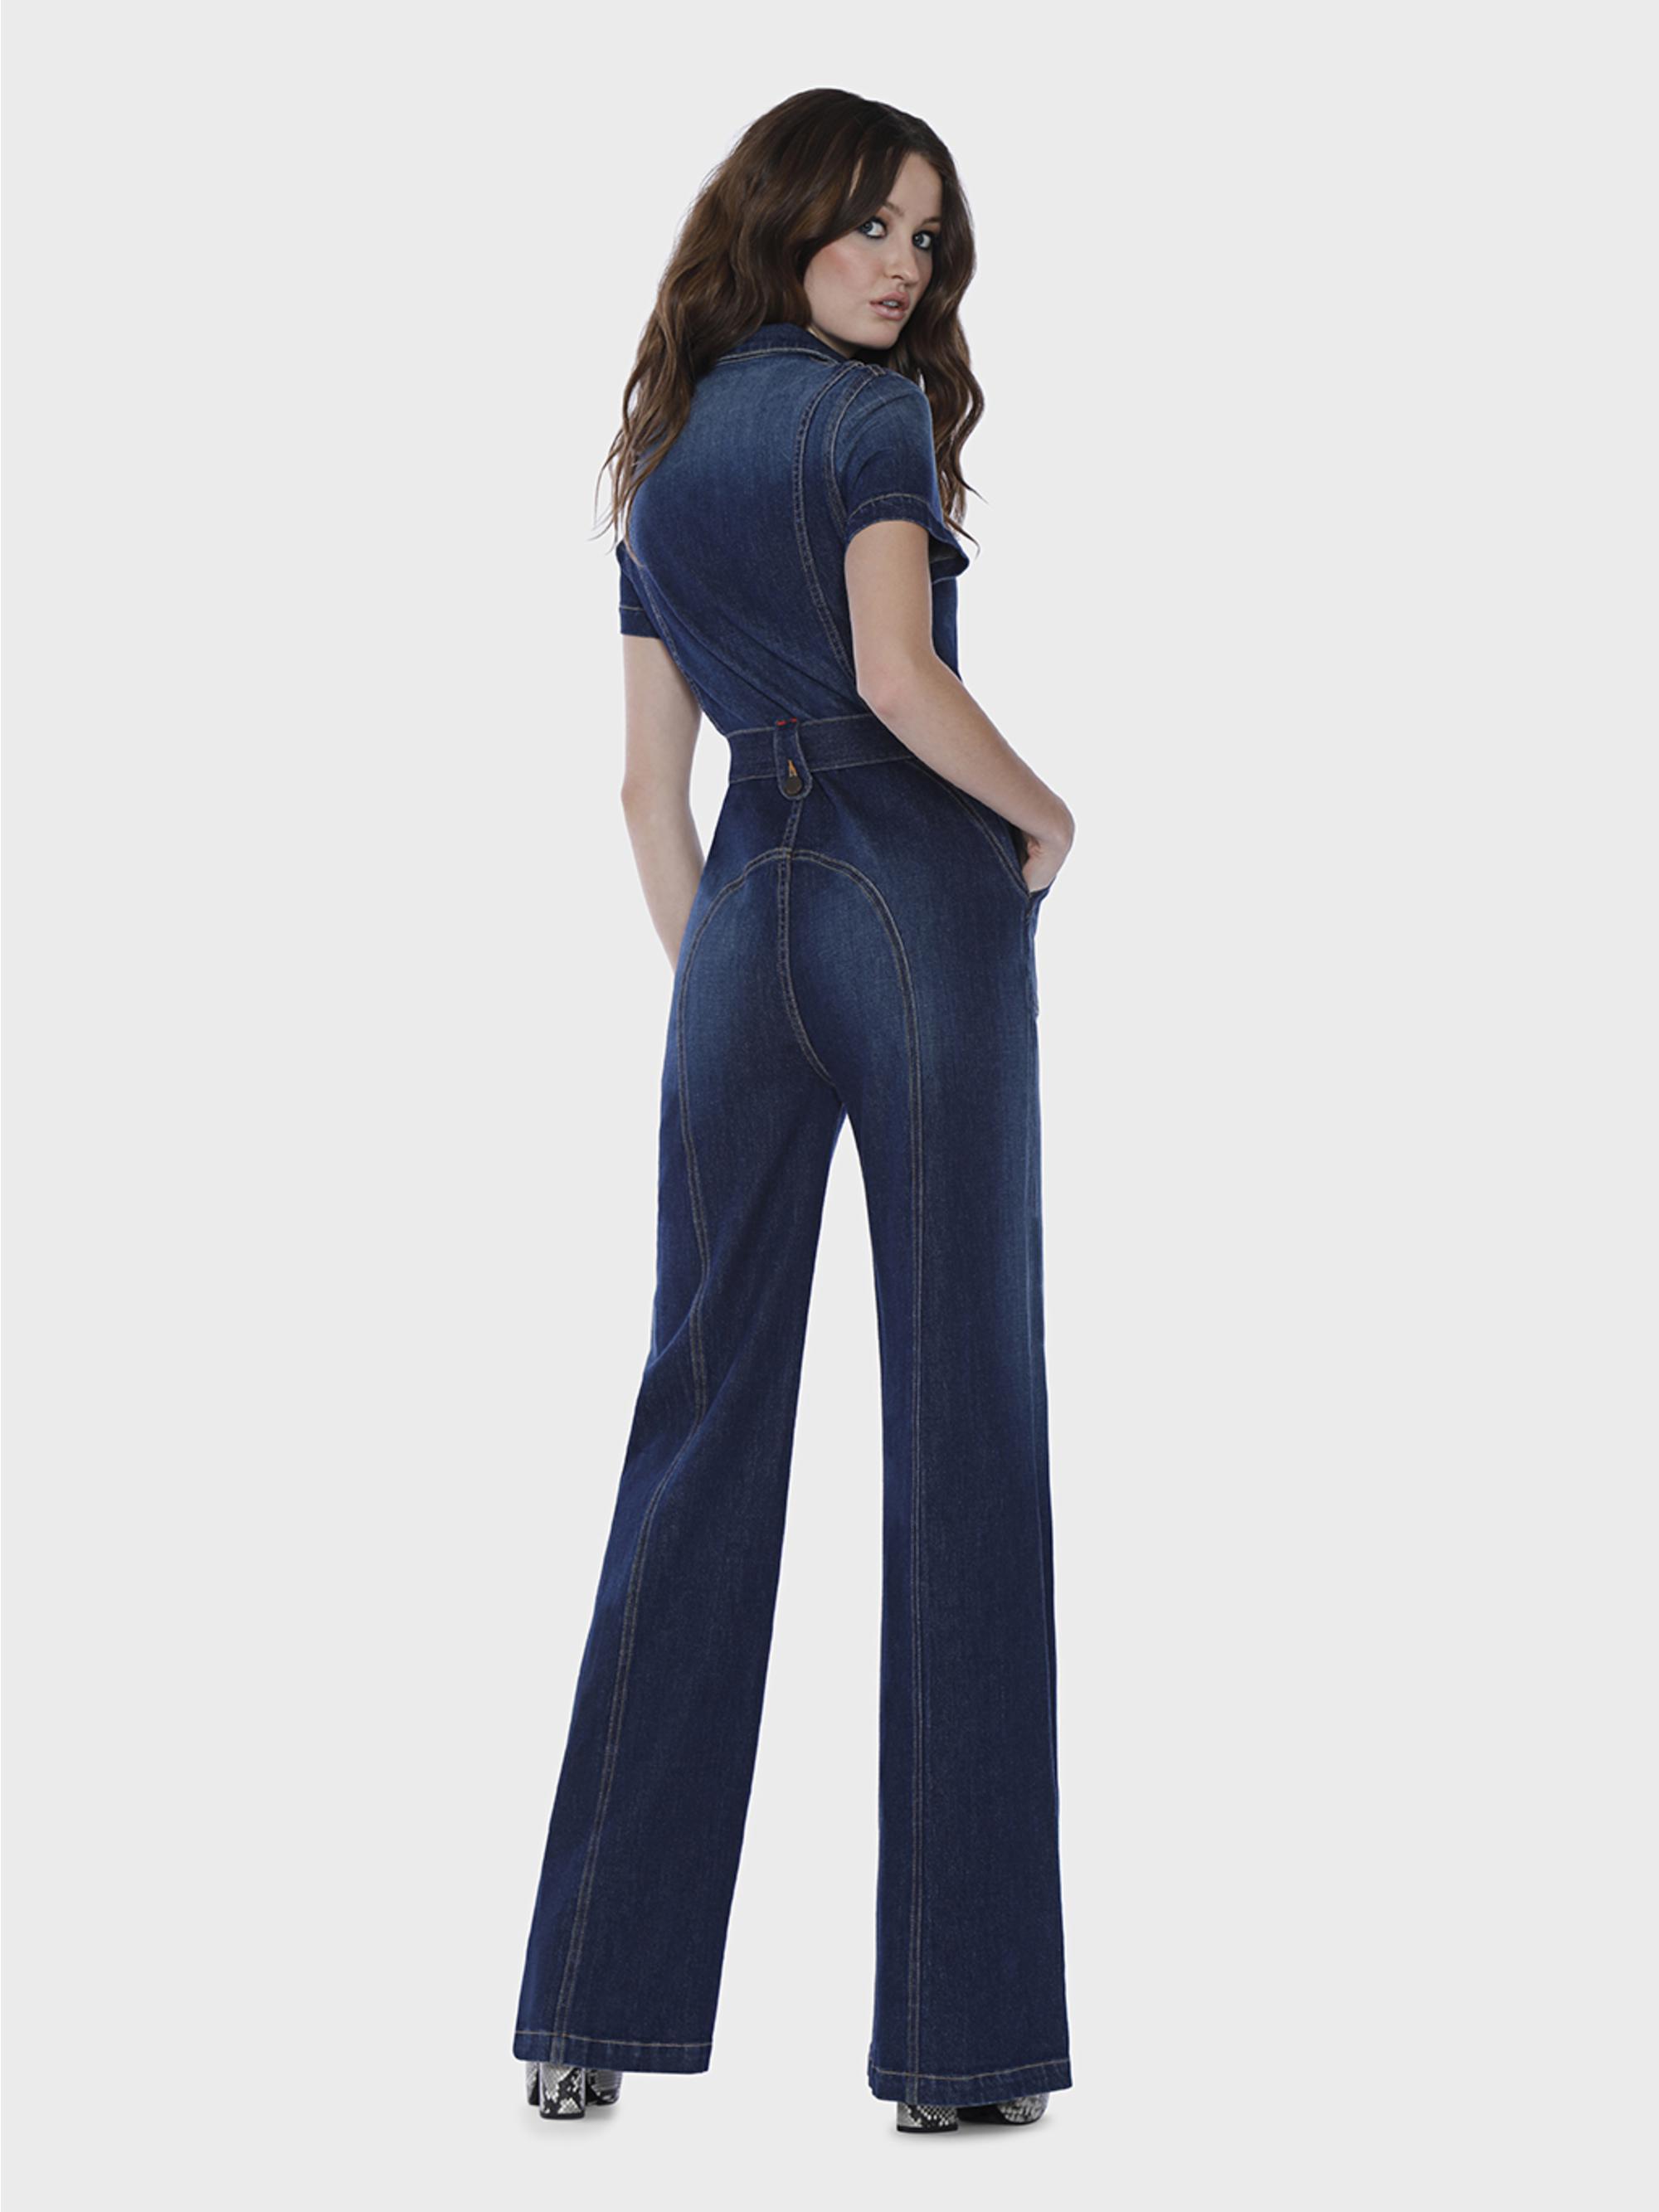 45f086f14de Alice + Olivia Gorgeous Wide Leg Jumpsuit in Blue - Lyst